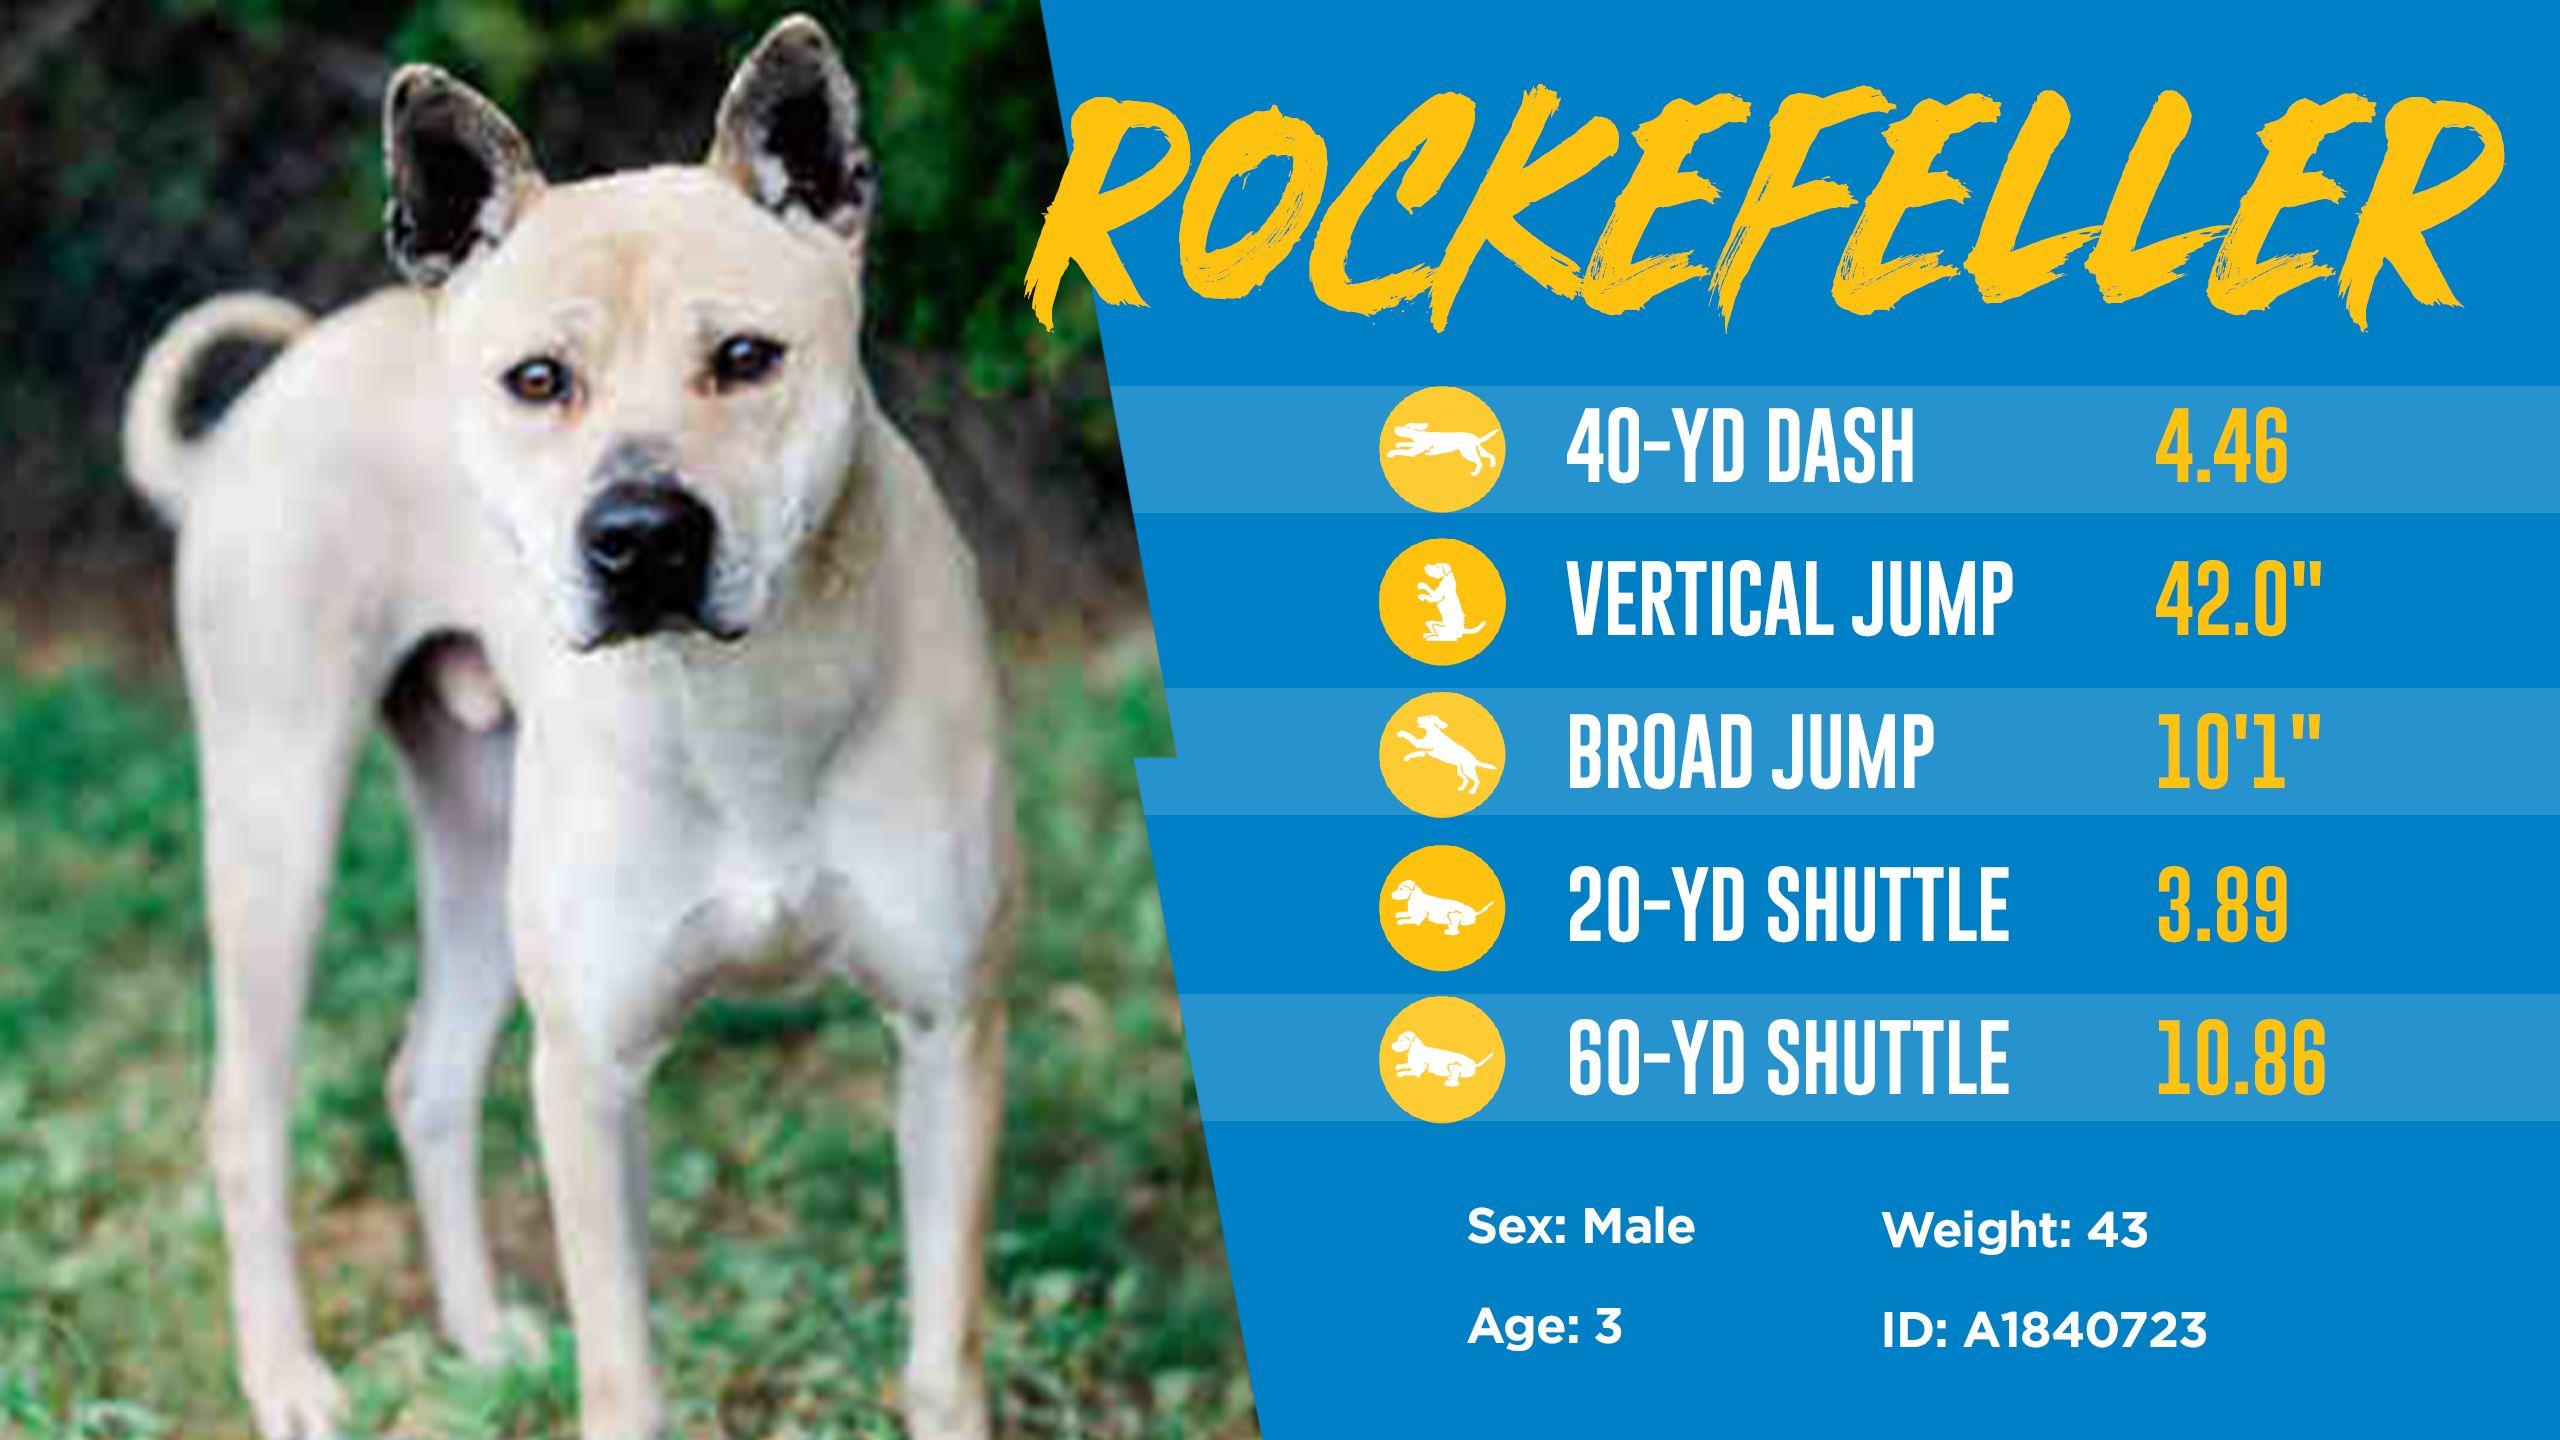 200501_Dog_Draft_Thumbnail_Rockefeller